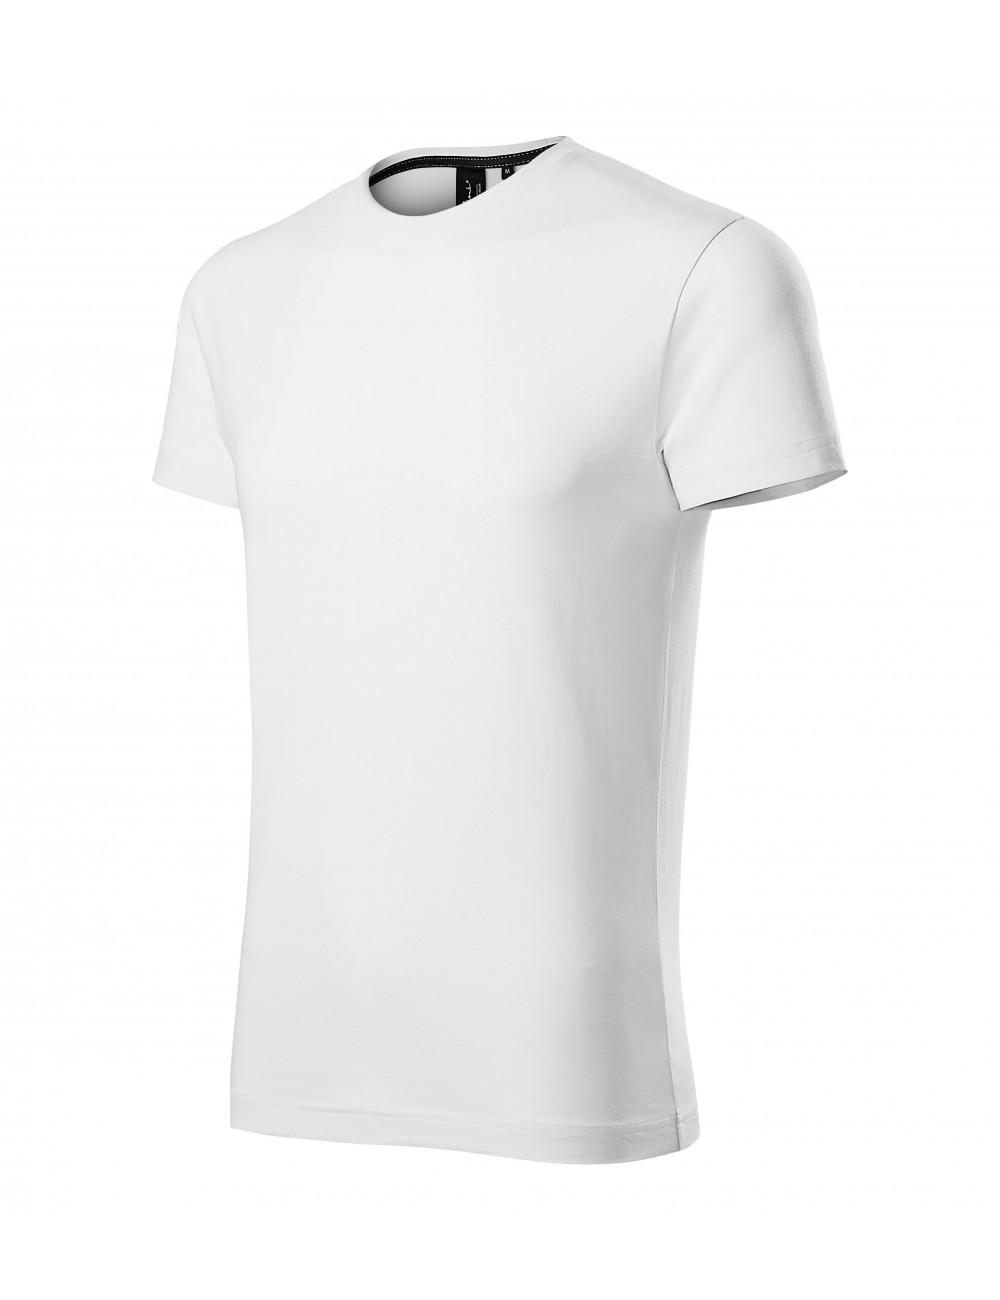 Adler MALFINIPREMIUM Koszulka męska Exclusive 153 biały